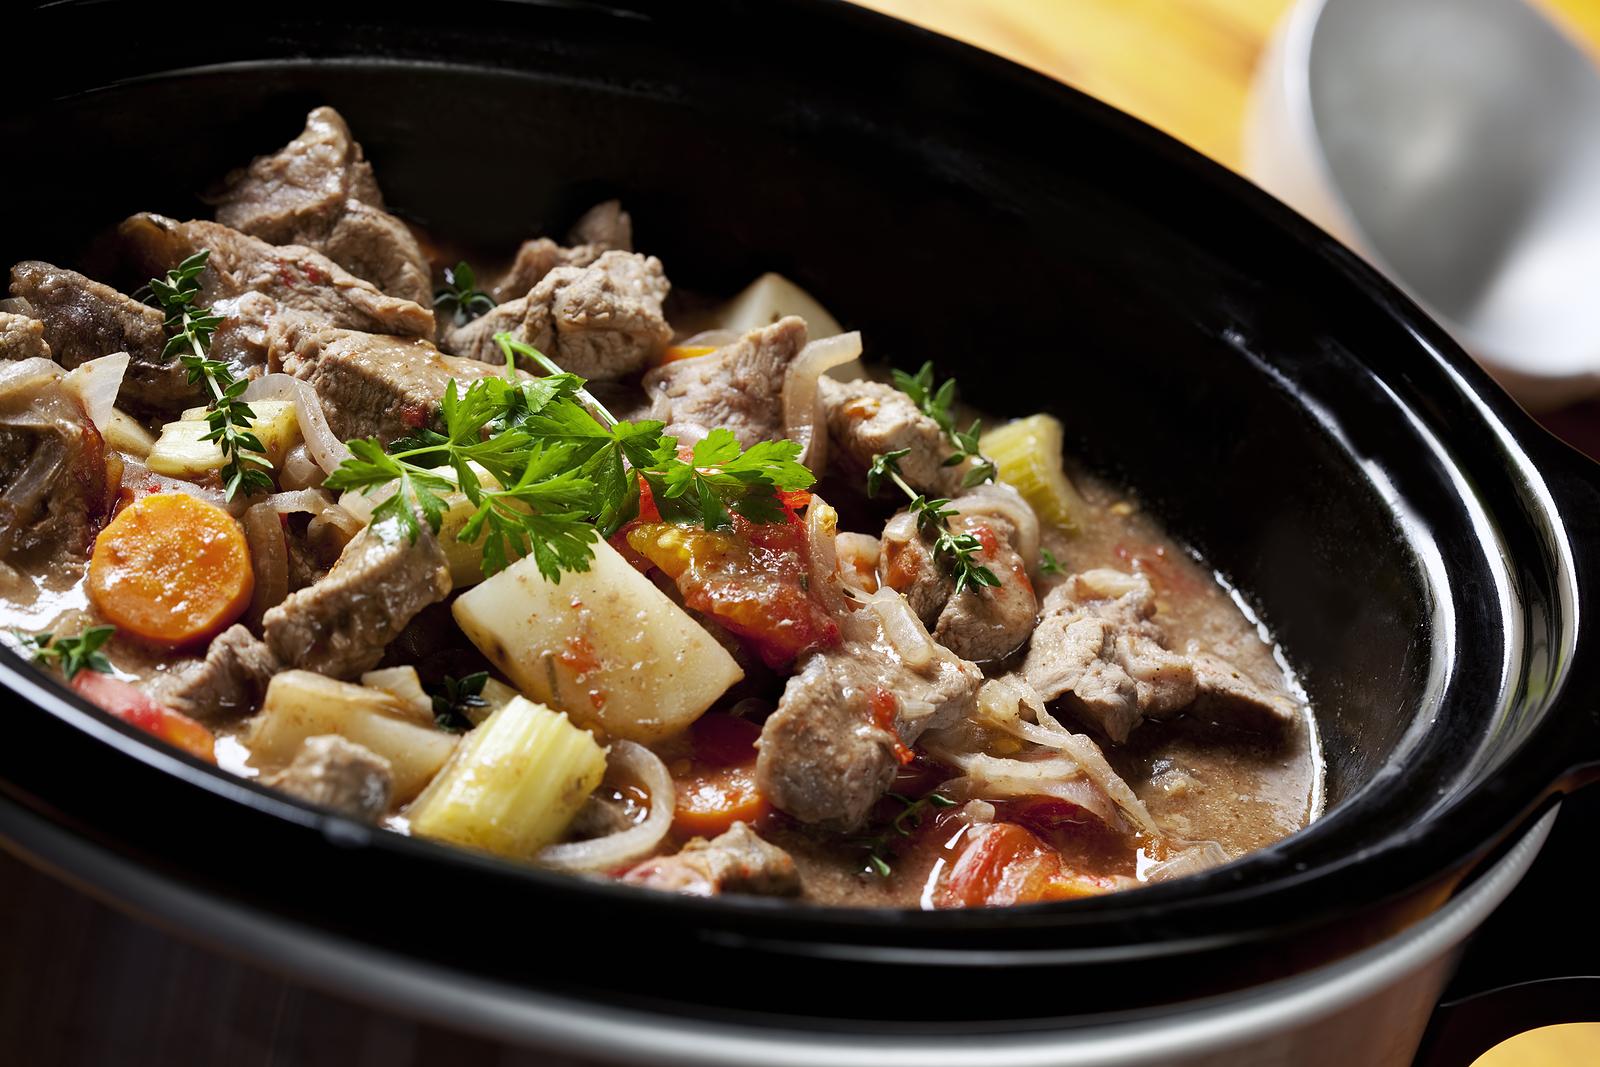 Elderly Care in Glendale AZ: Slow Cooker Meals